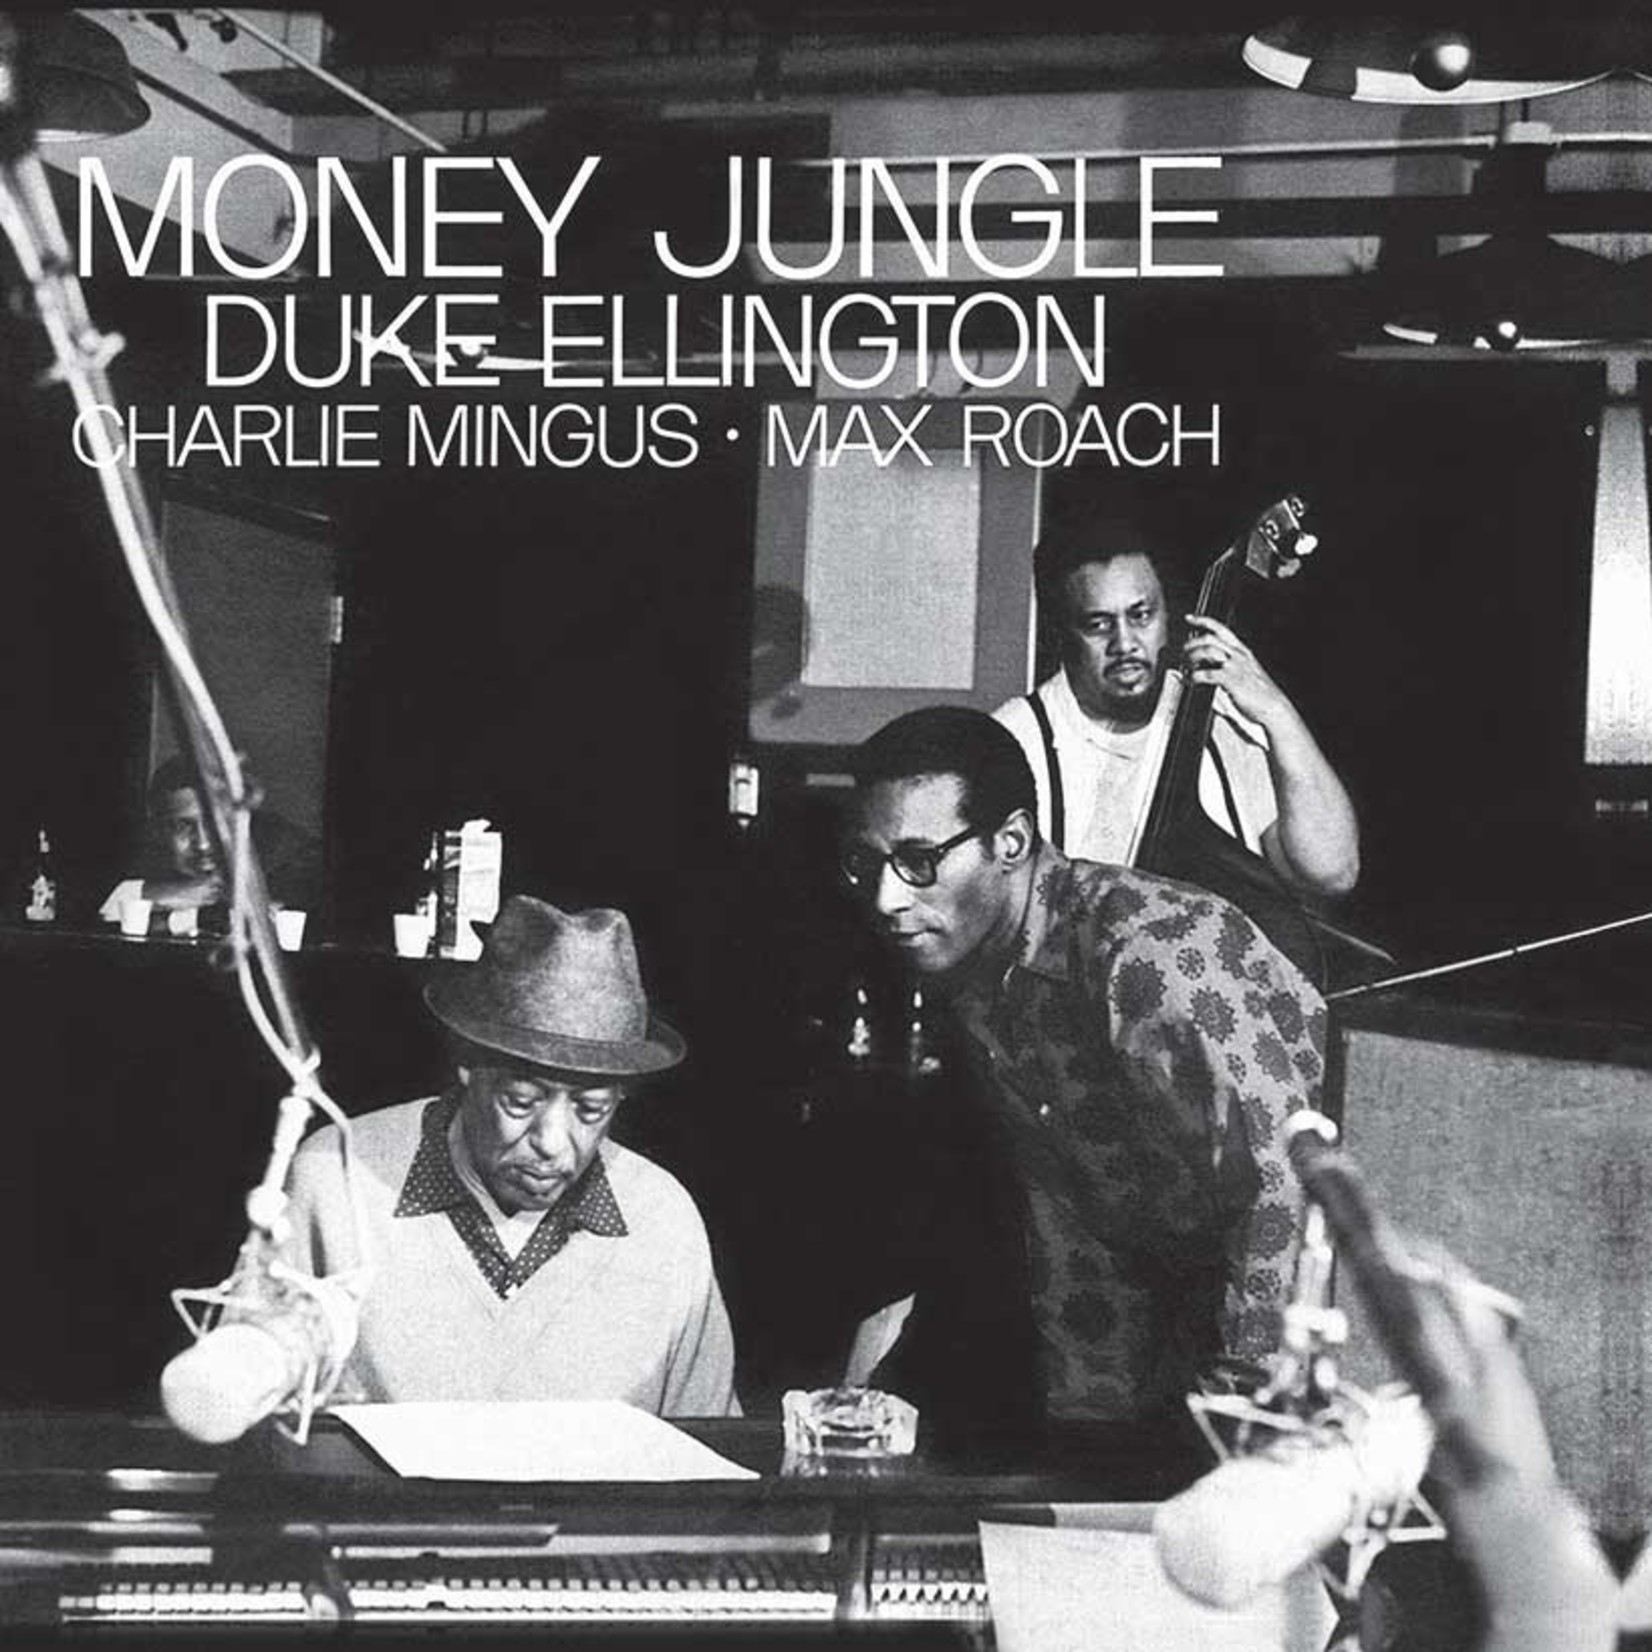 [New] Ellington, Duke: Money Jungle (Tone Poet Series)